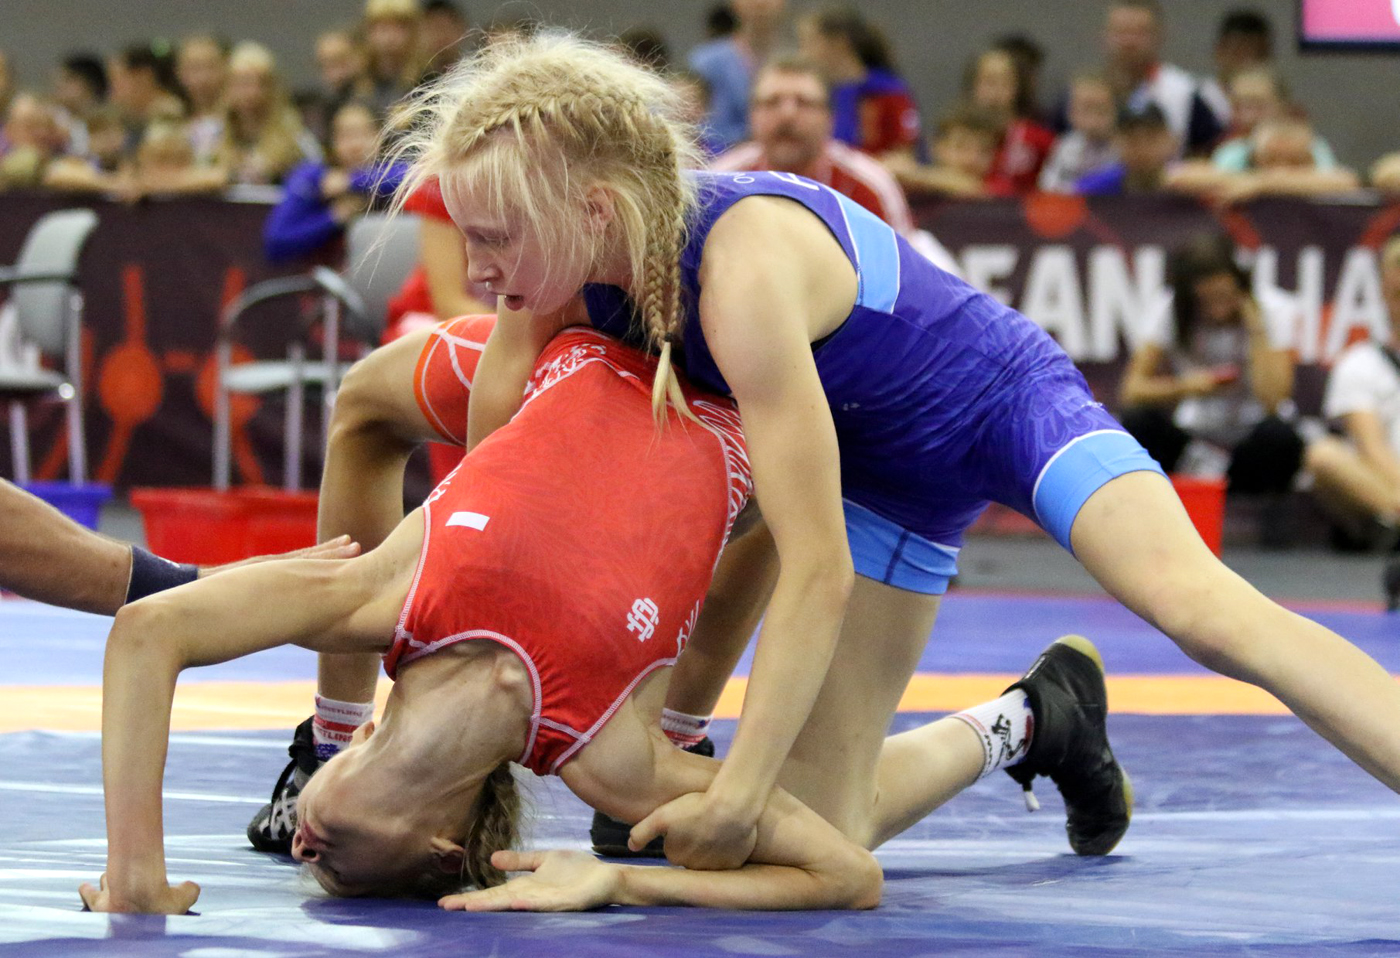 Amelia Tomala zdobyła srebrny medal na MEwZapasach dolat15